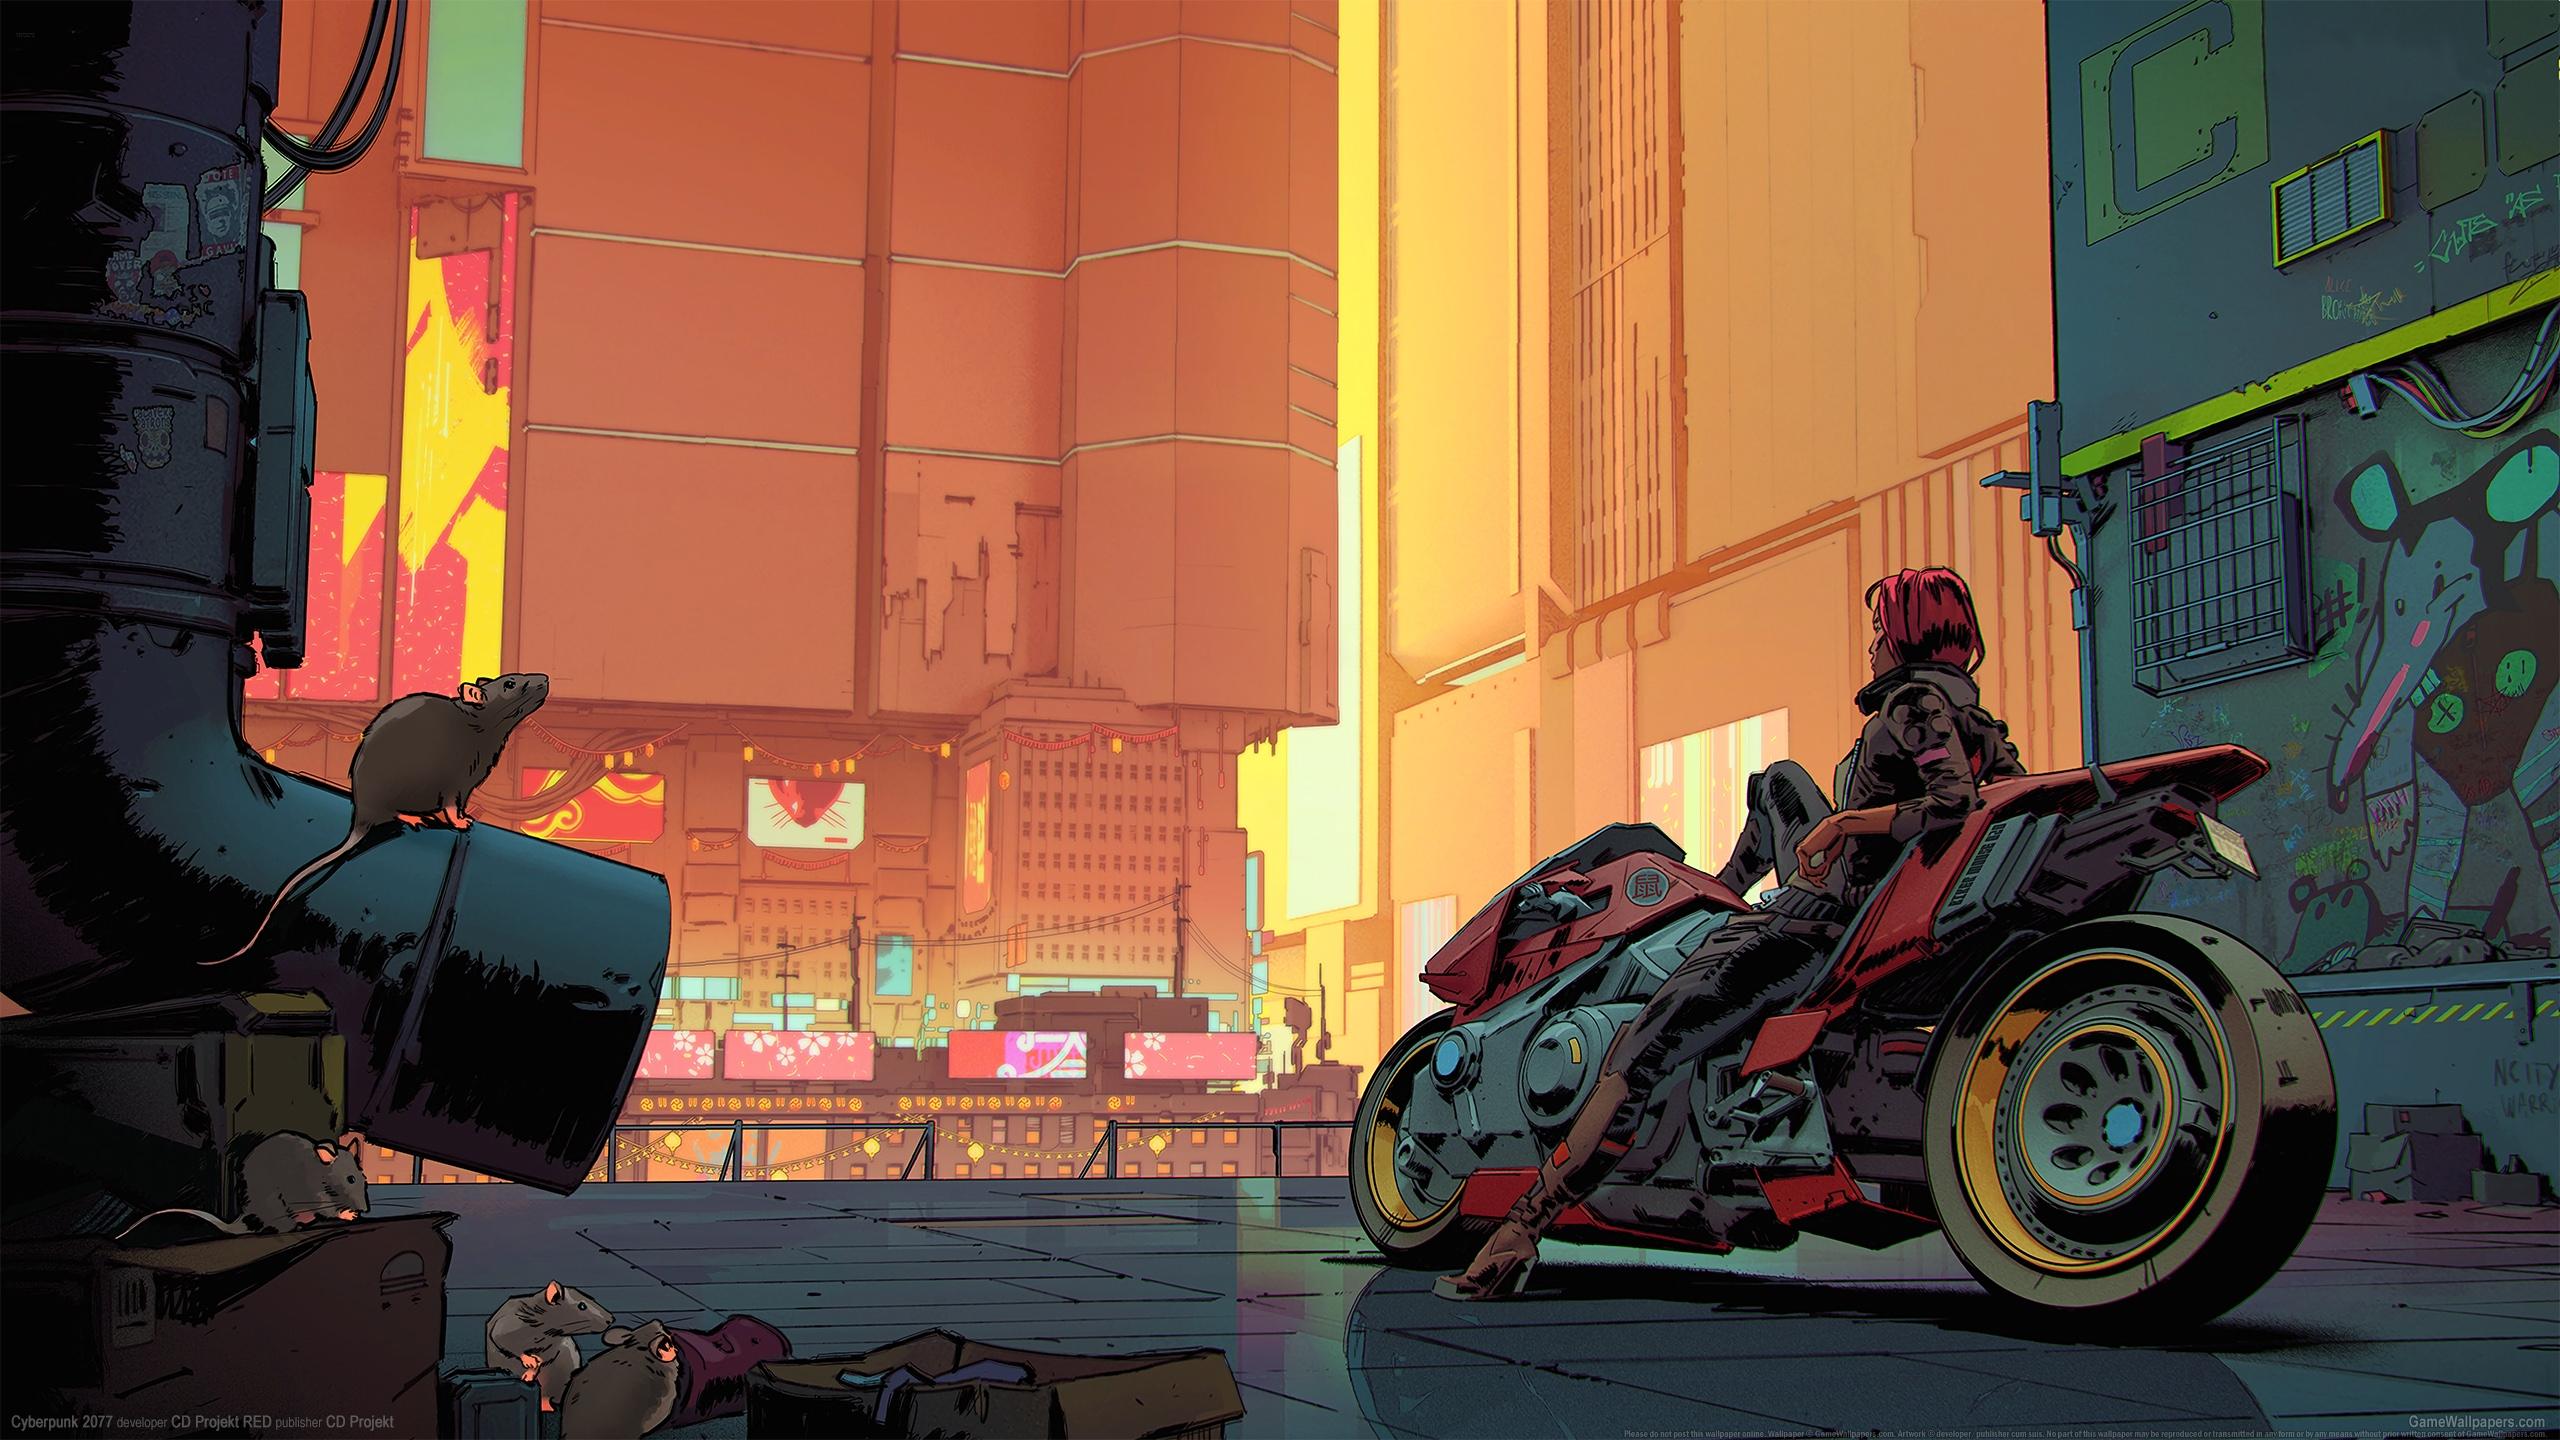 Cyberpunk 2077 2560x1440 fond d'écran 27